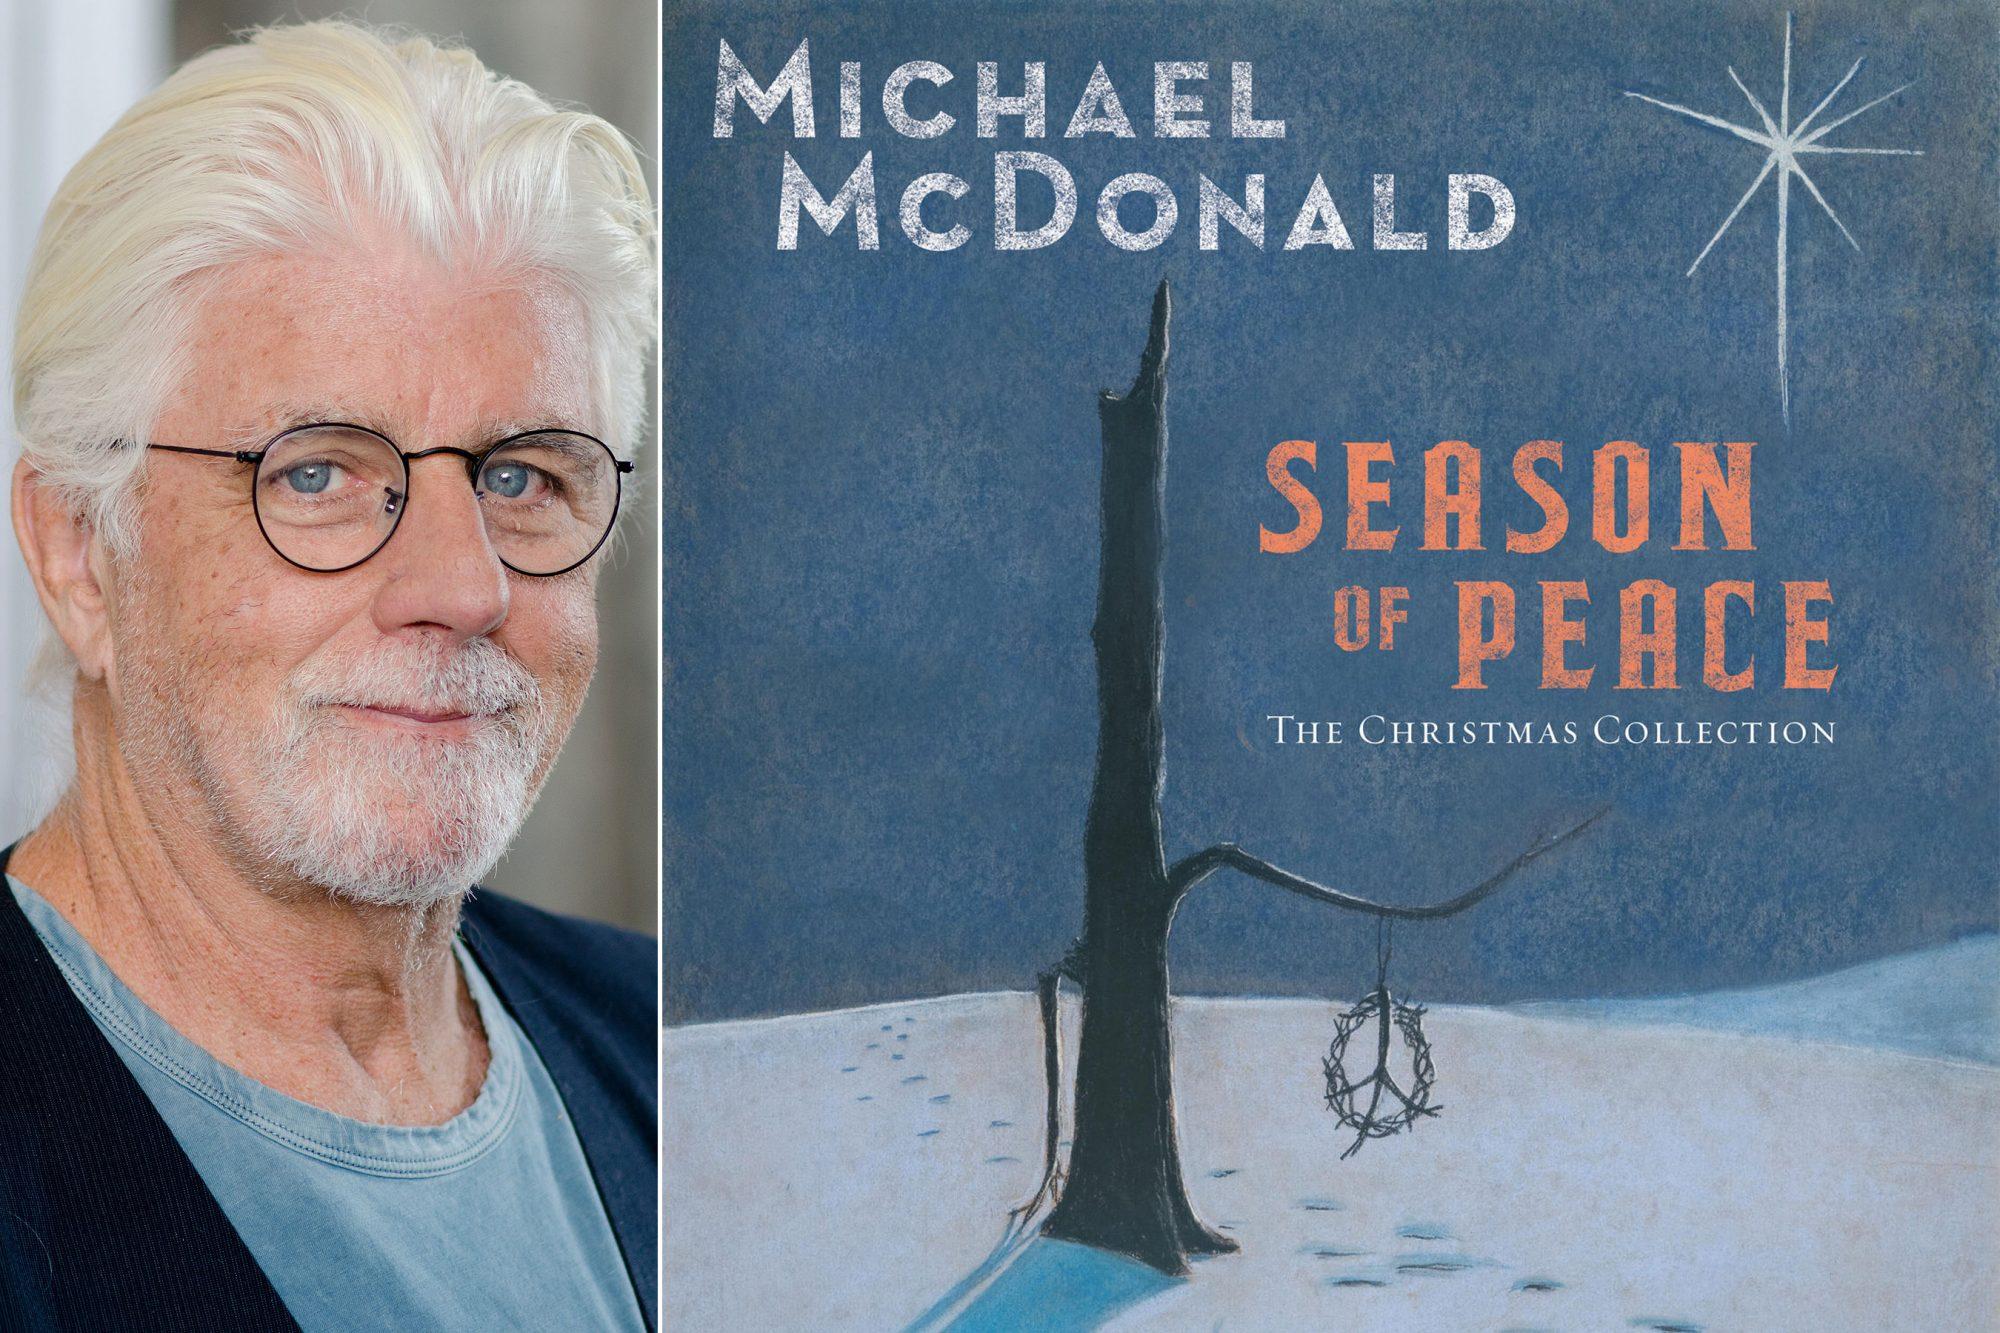 michael-mcdonald-season-of-peace